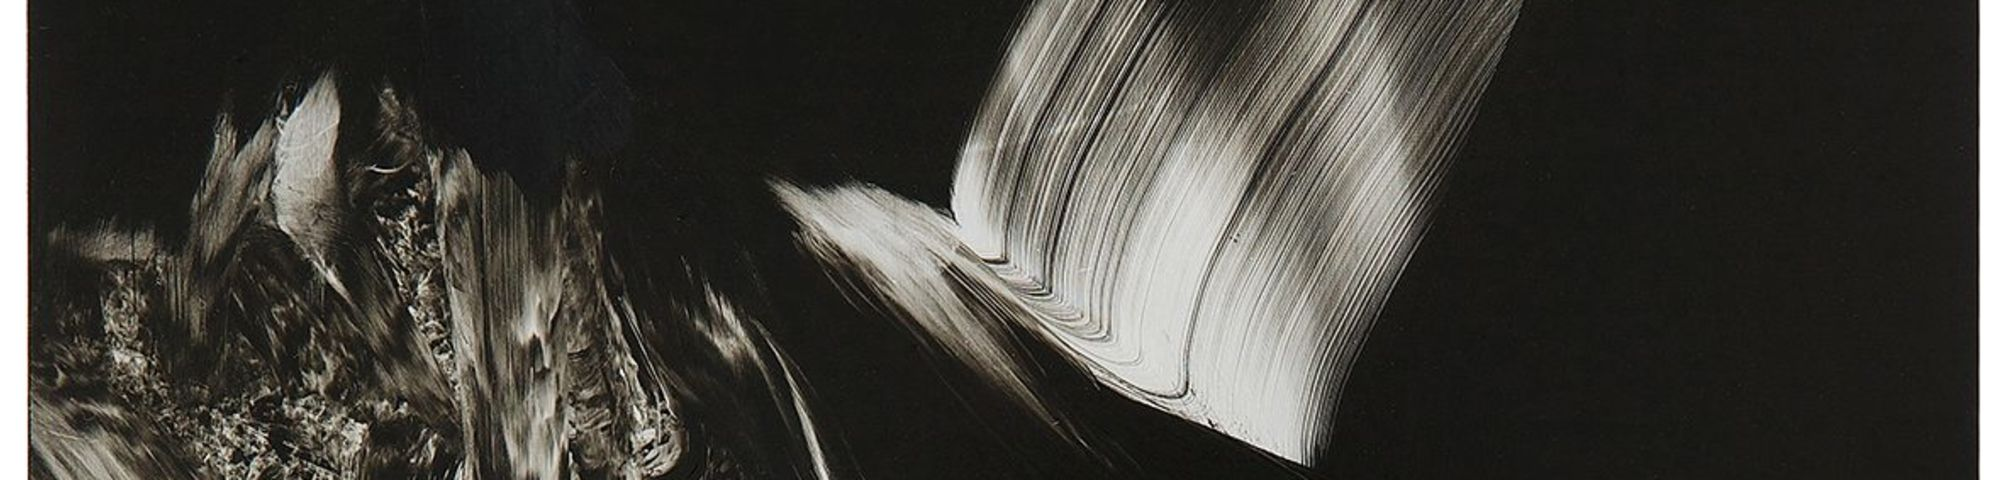 Jim Threapleton. Symptom XIV. 2015. Oil on Aluminium. 30 x 30 cm